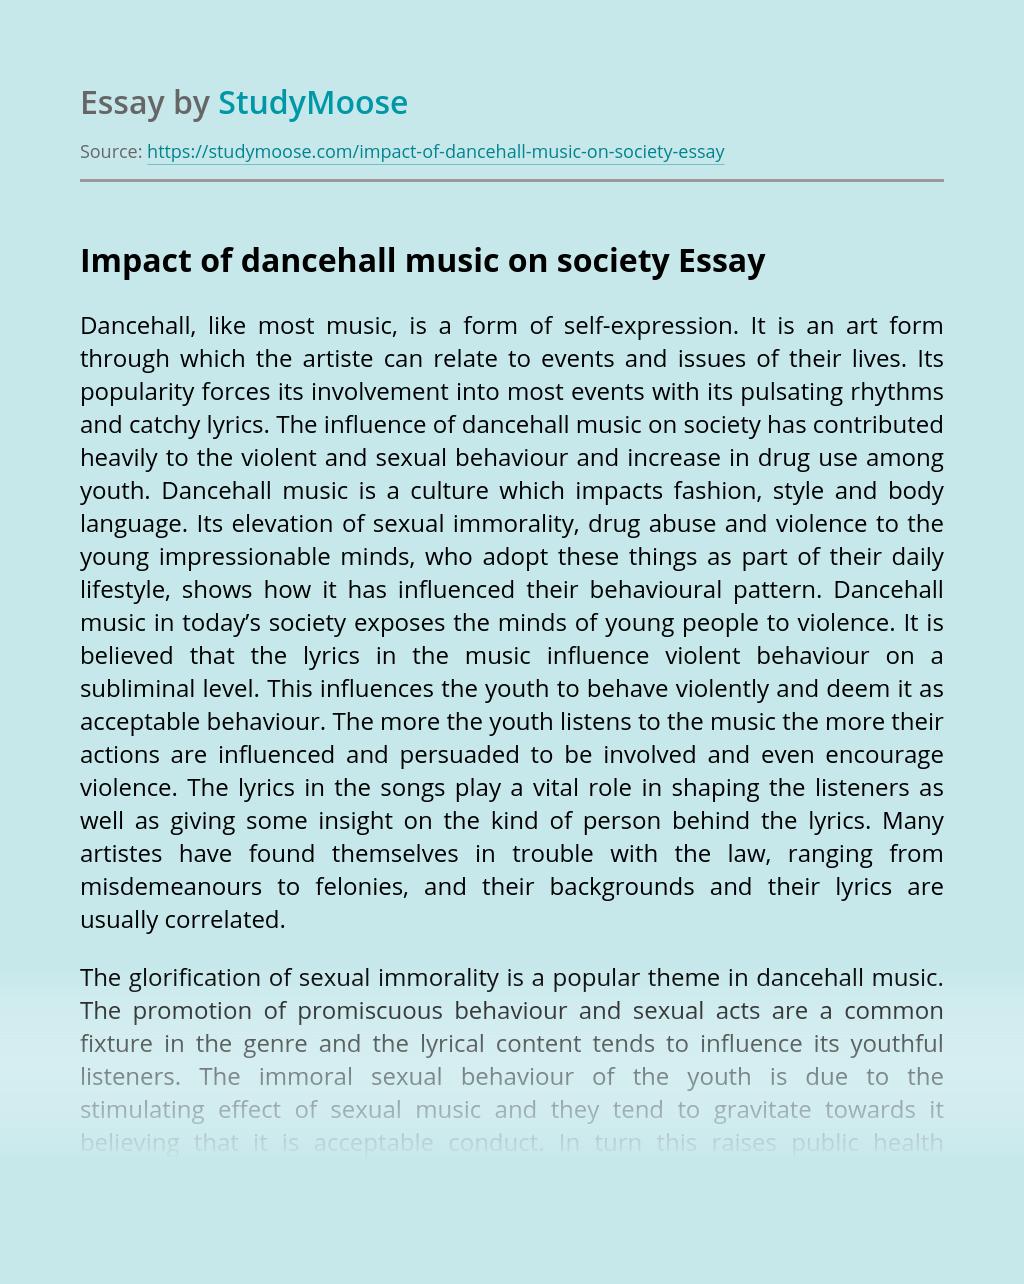 Impact of dancehall music on society